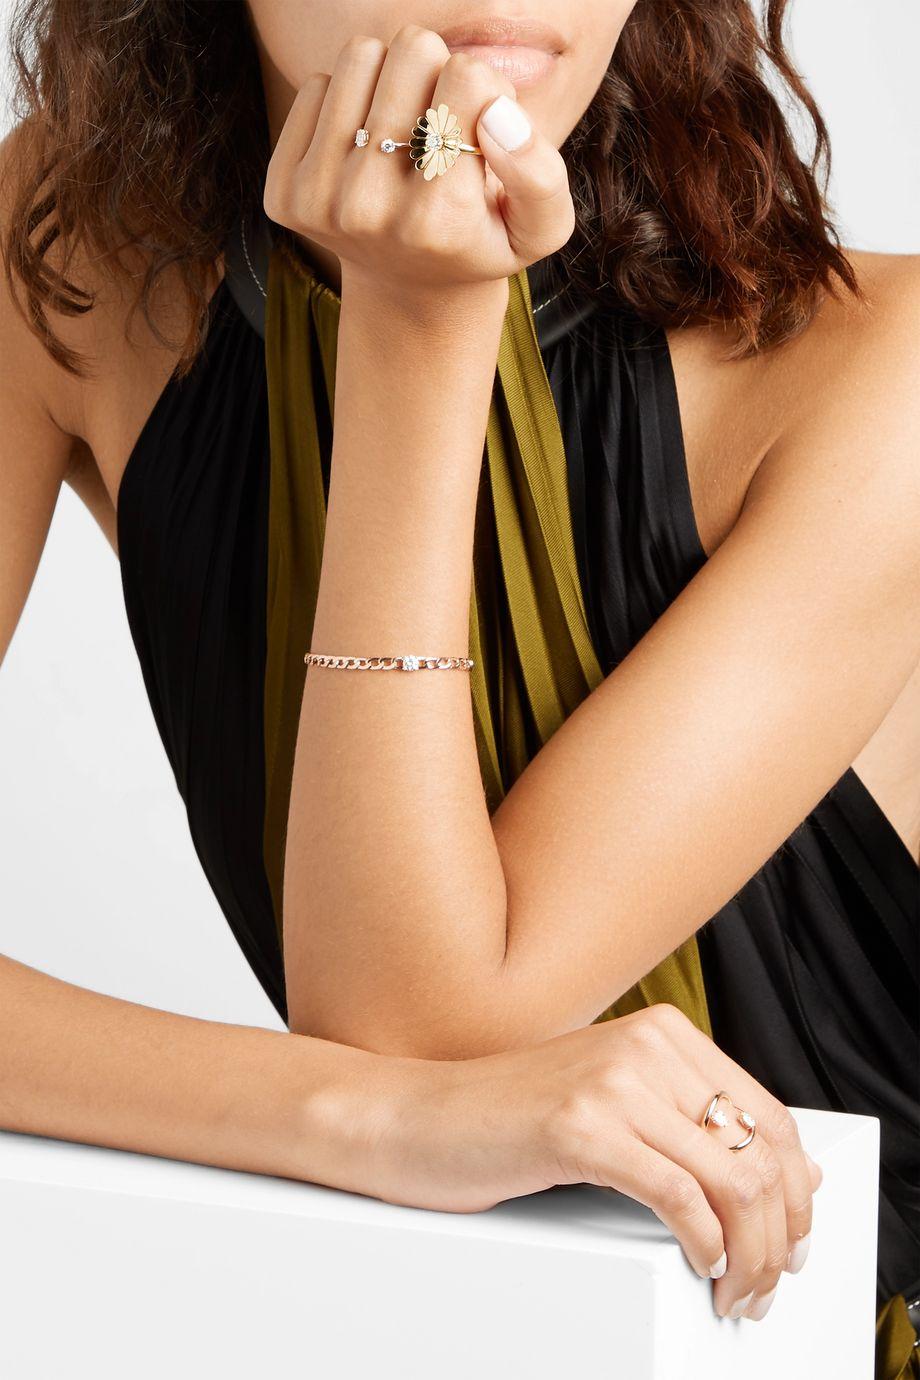 Anita Ko Bague en or 18carats et diamants